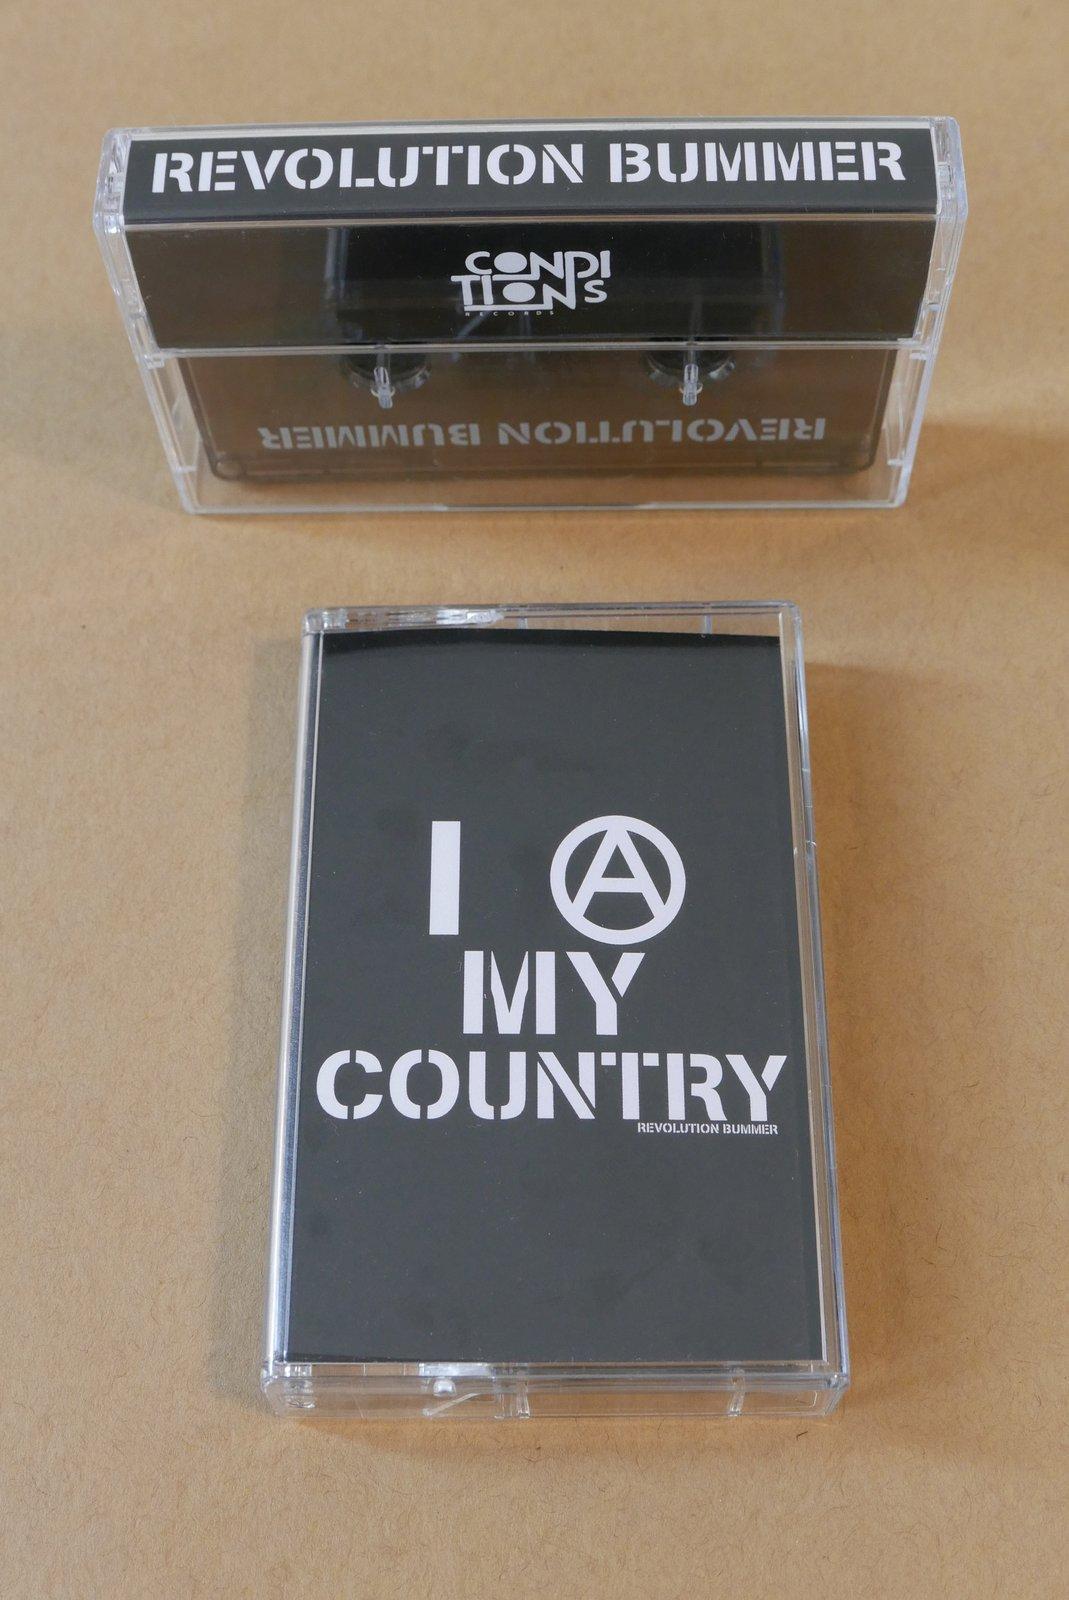 Revolution Bummer - I (A) MY COUNTRY Cassette